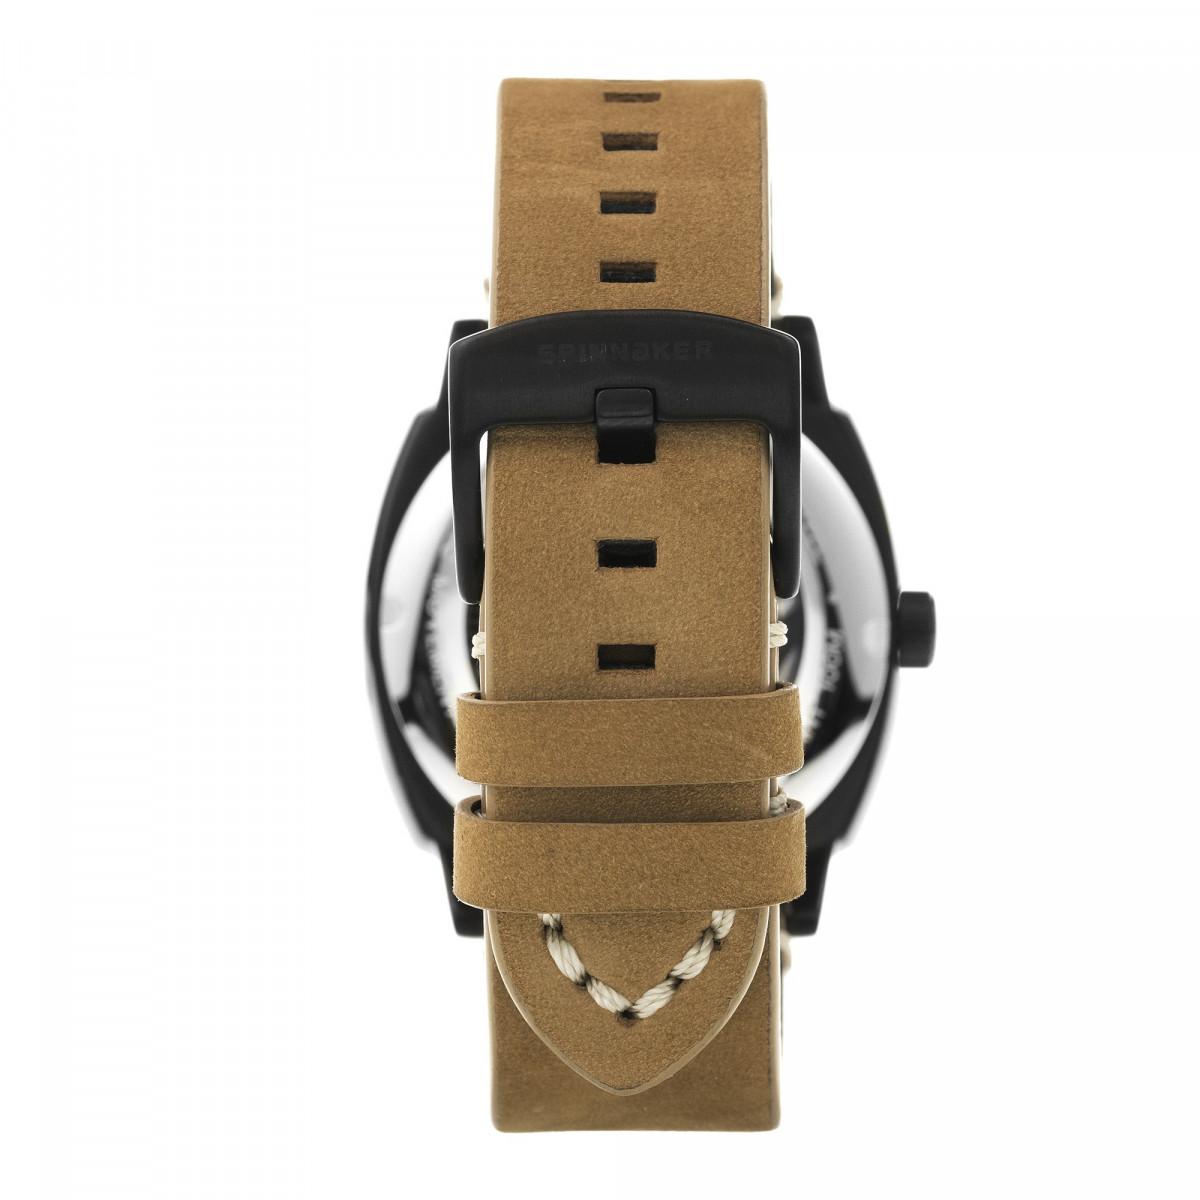 Montre Spinnaker HULL Automatique  - Cadran Noir - SP-5059-04